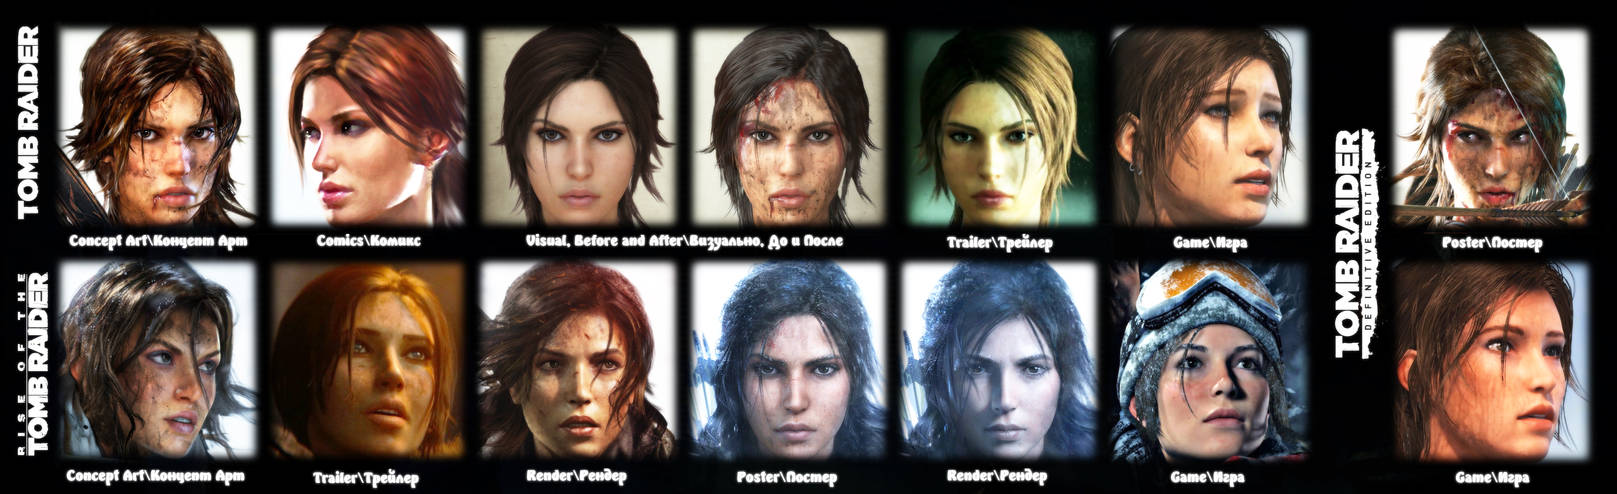 tomb raider 2013 face model